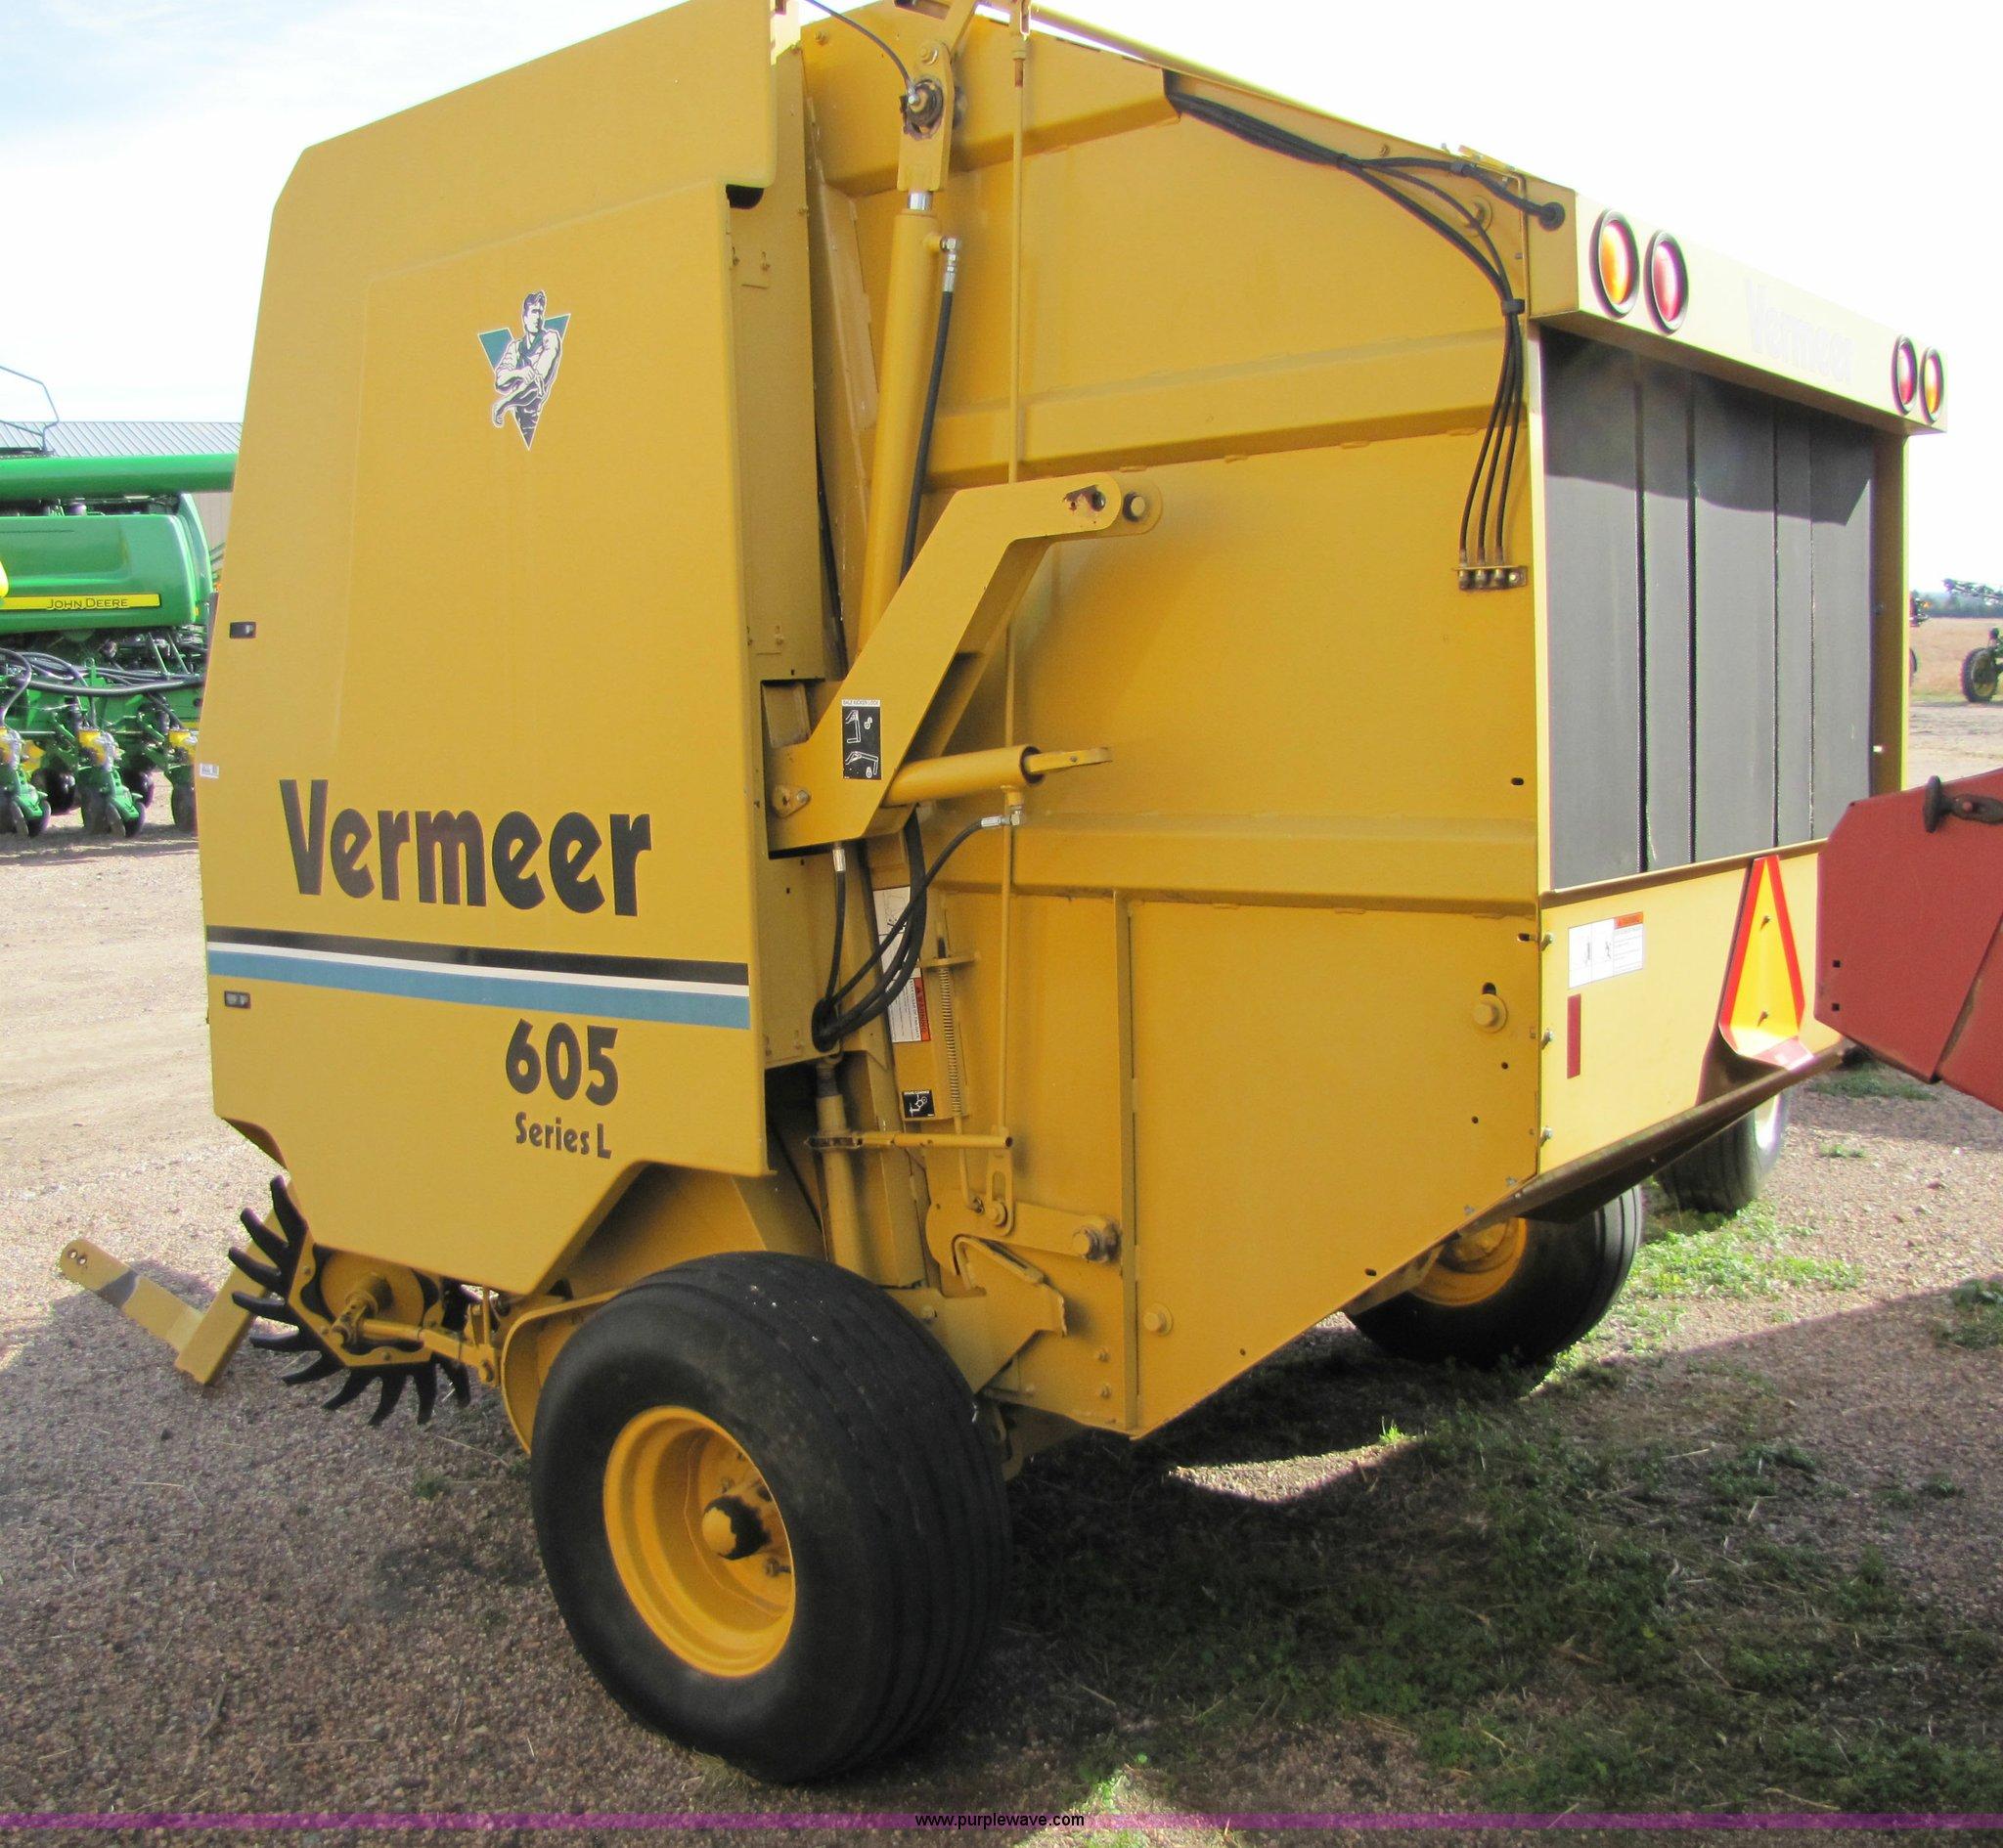 vermeer 605 series l round baler item 5215 sold decembe rh purplewave com